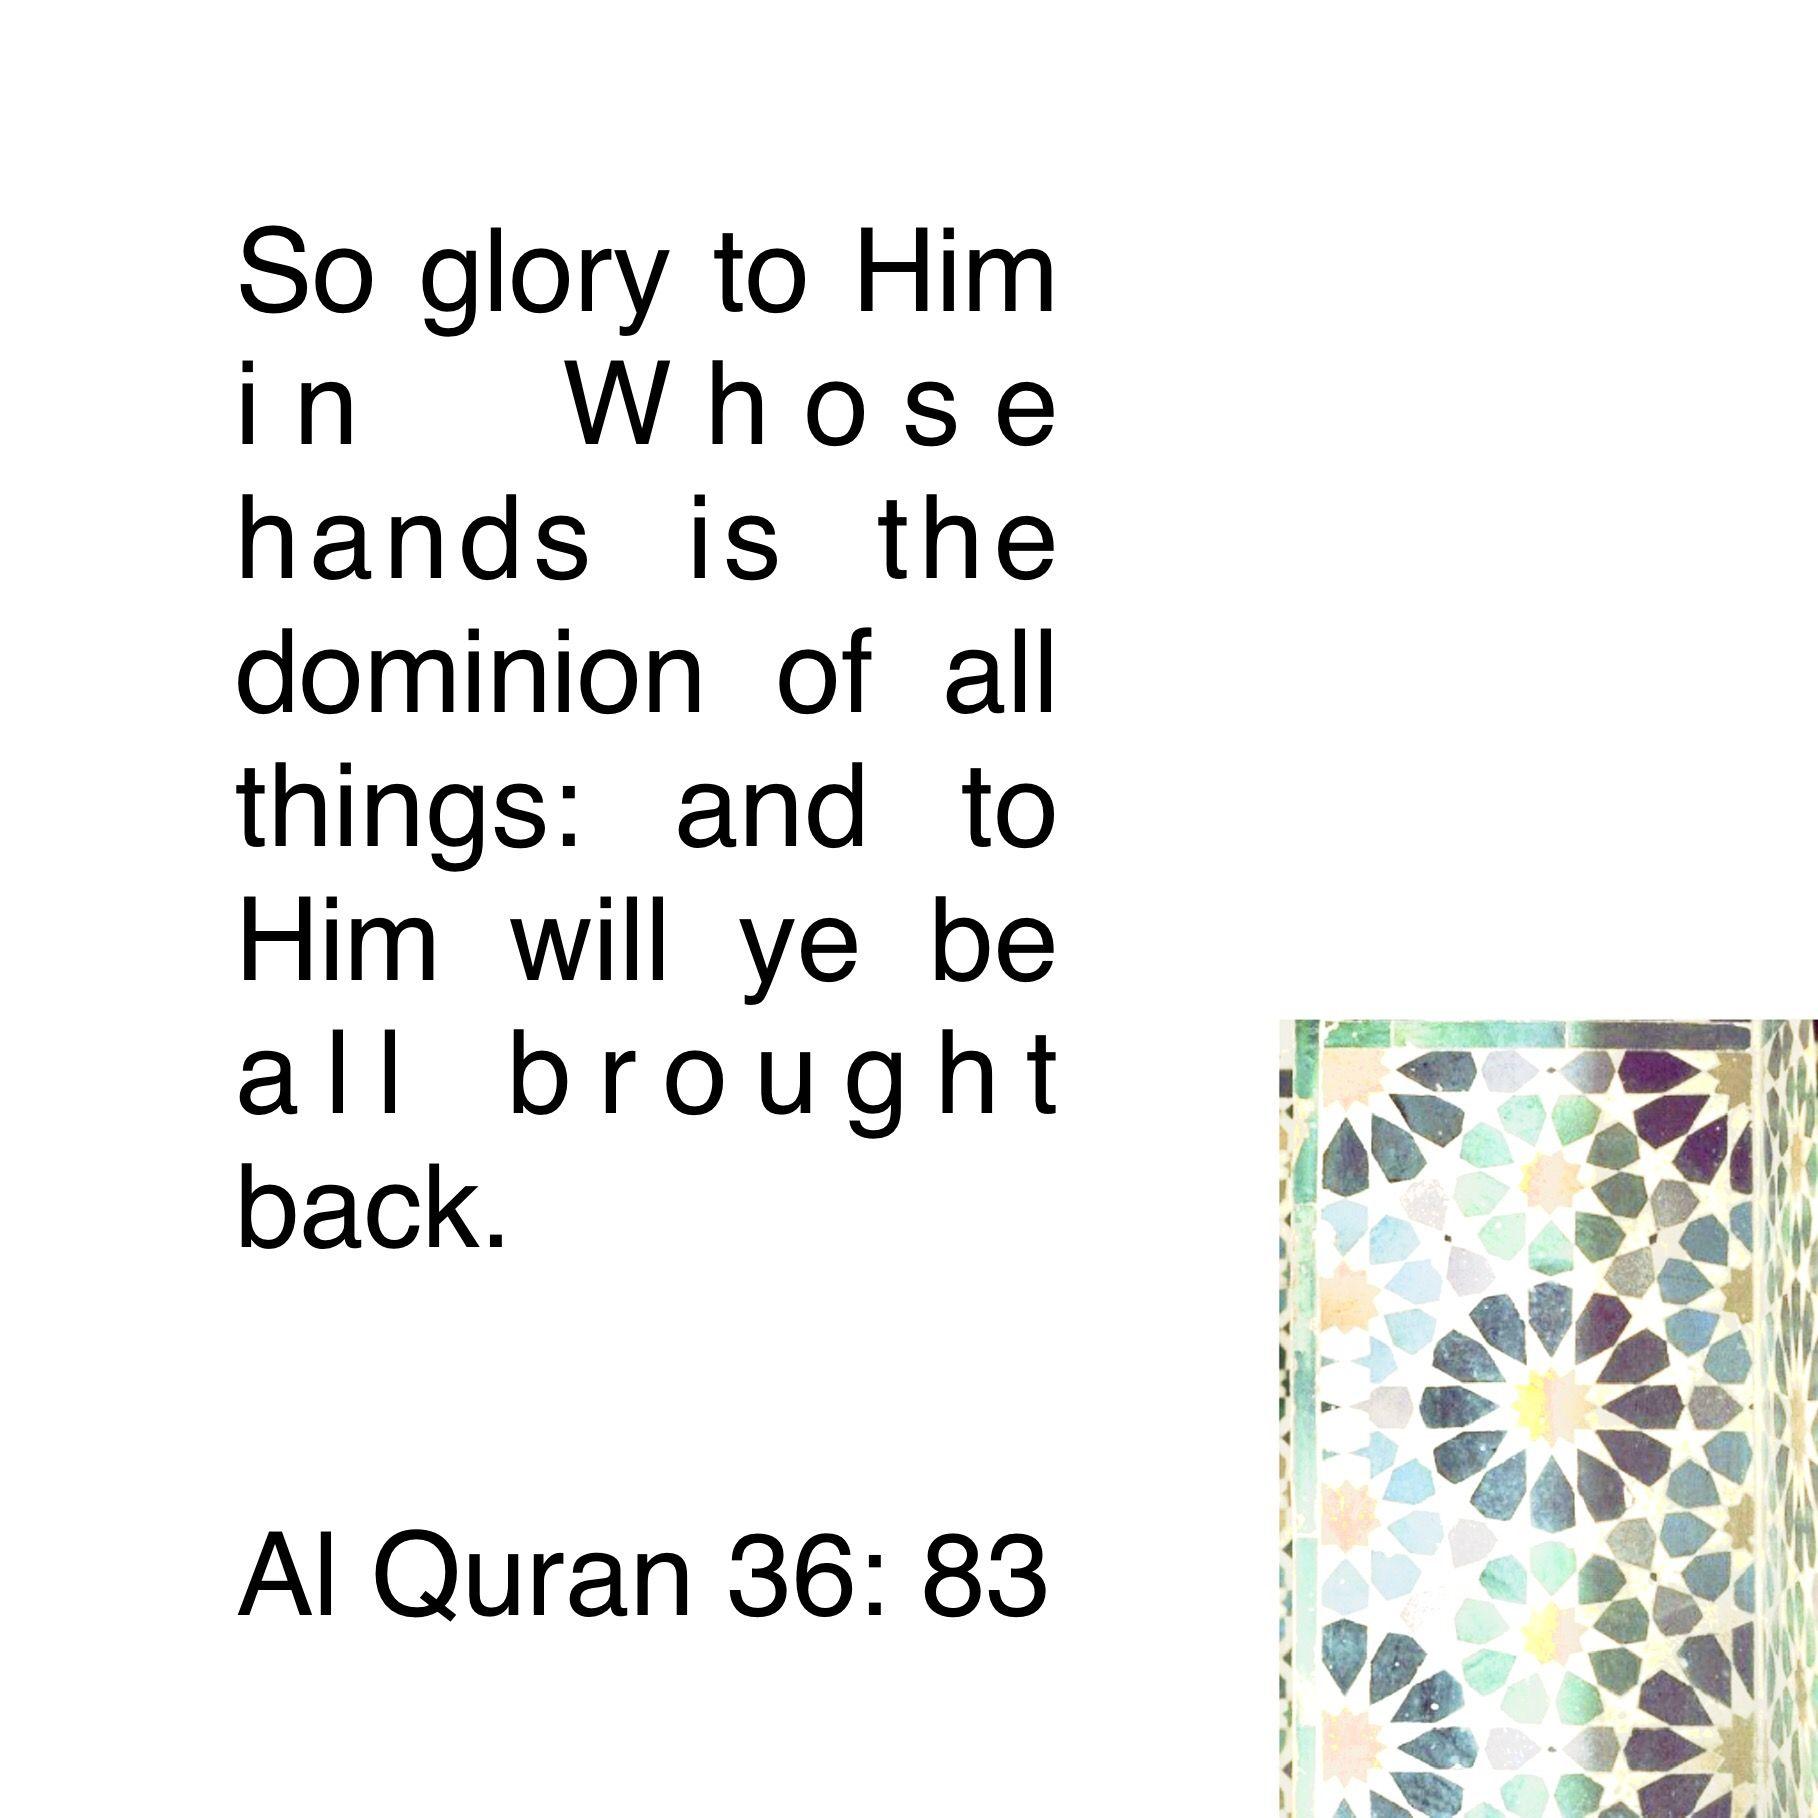 Pin by Islam on Quran and Hadith | Quran, Hadith, Islam